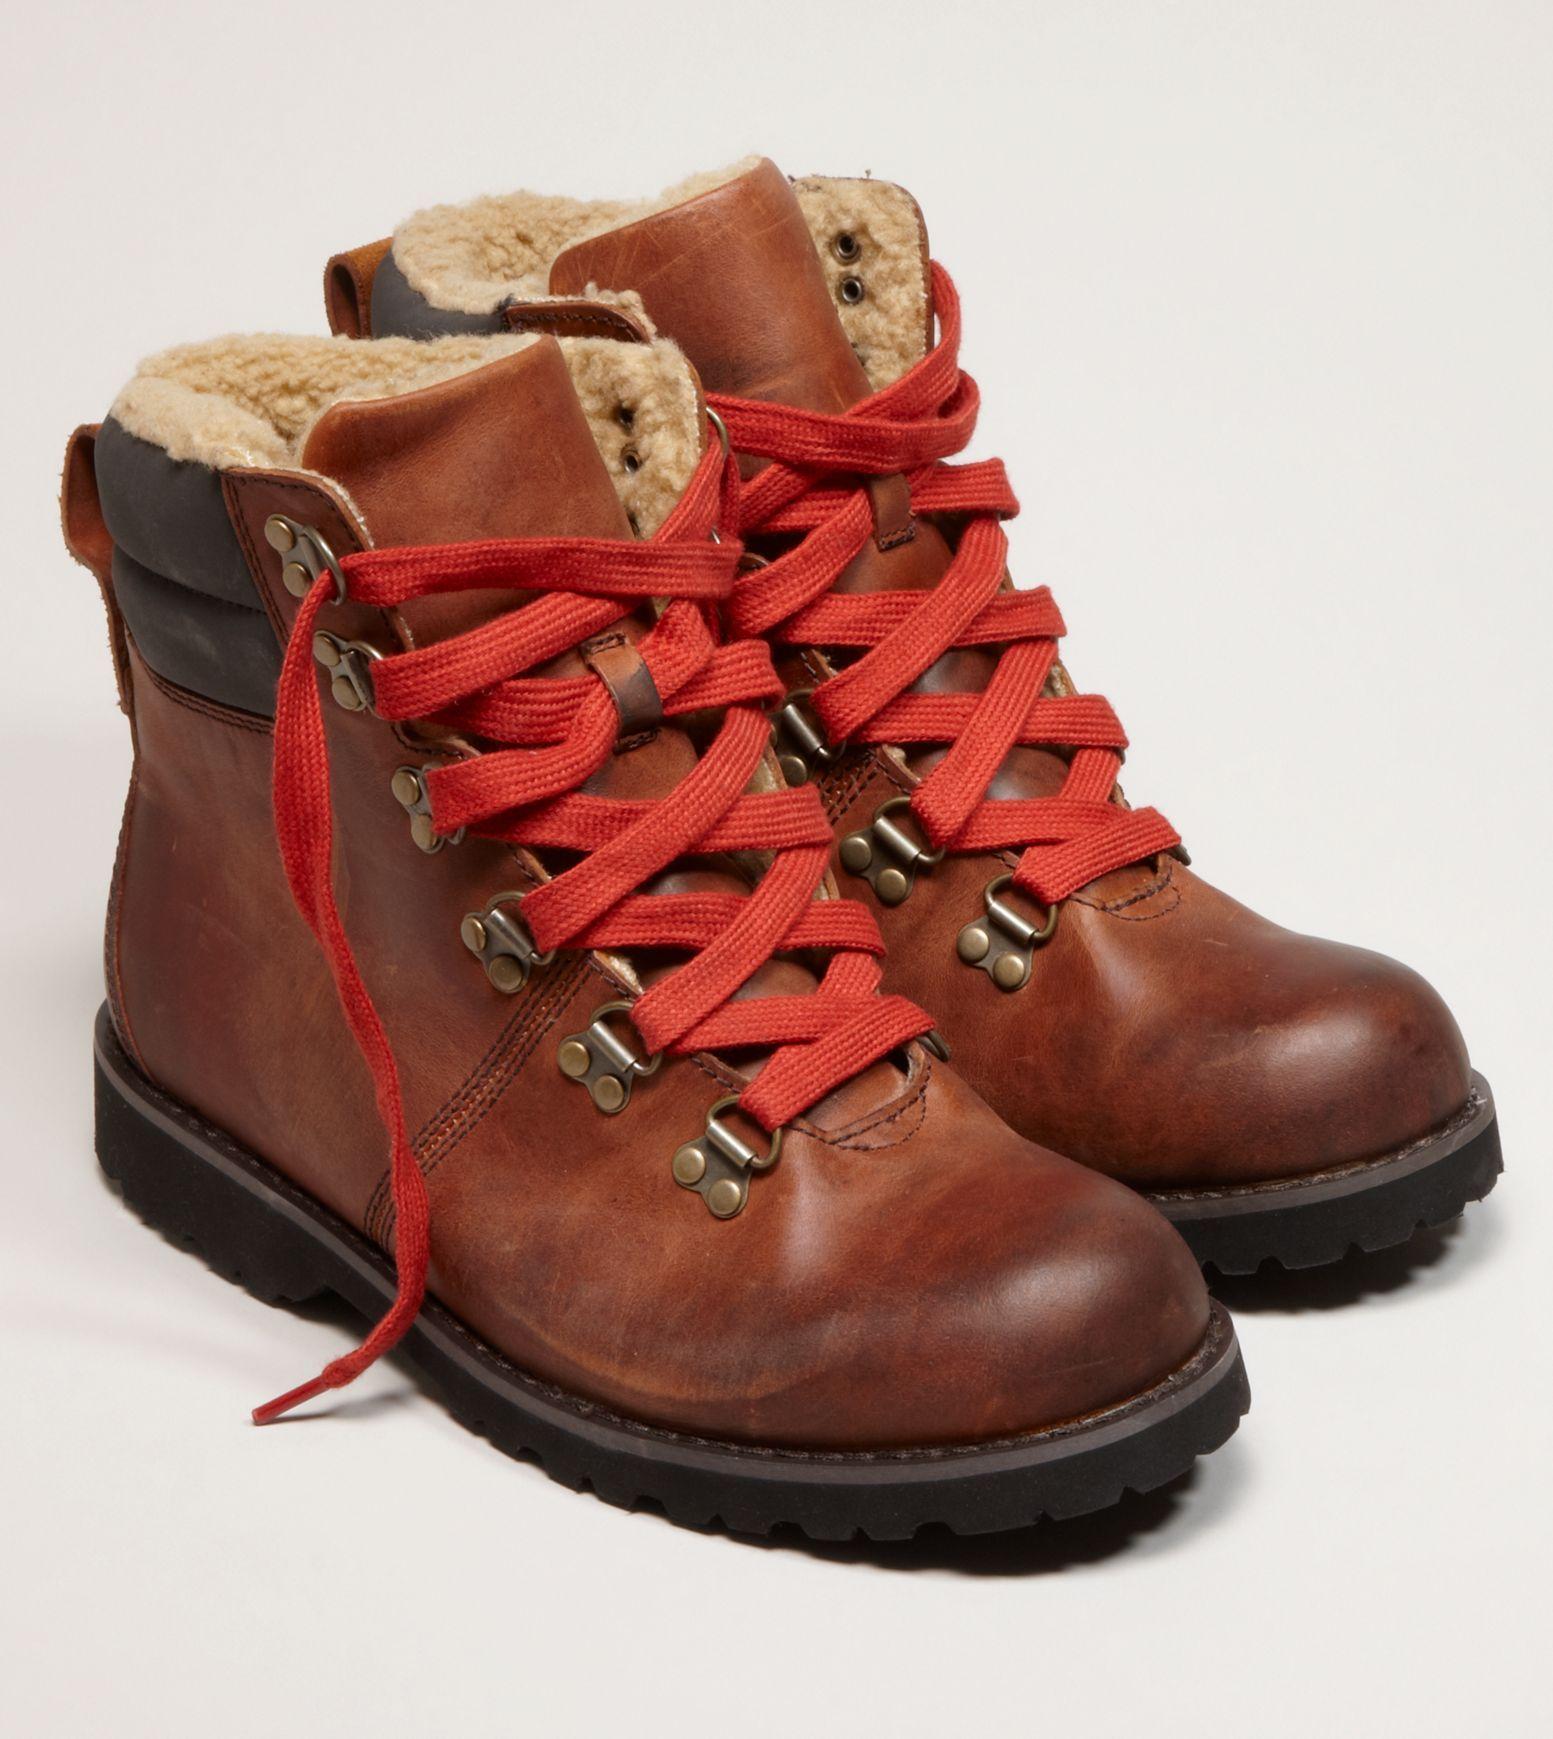 995 Best FaNCY FoOTWeAR images | Me too shoes, Shoe boots